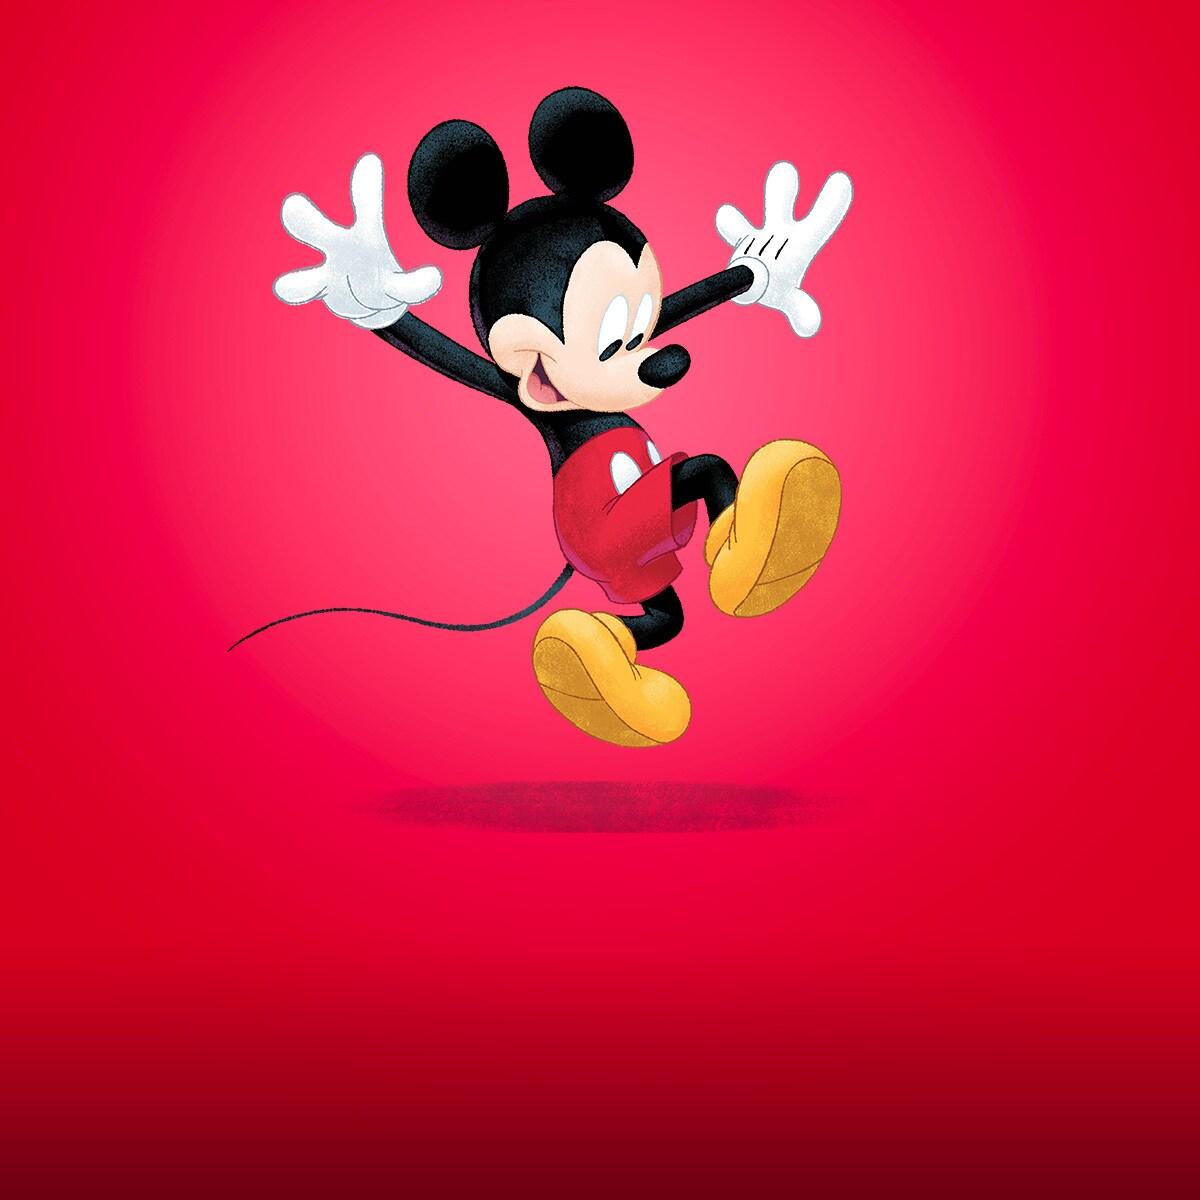 Disney Tv Latest Information On Disney Channel Disney